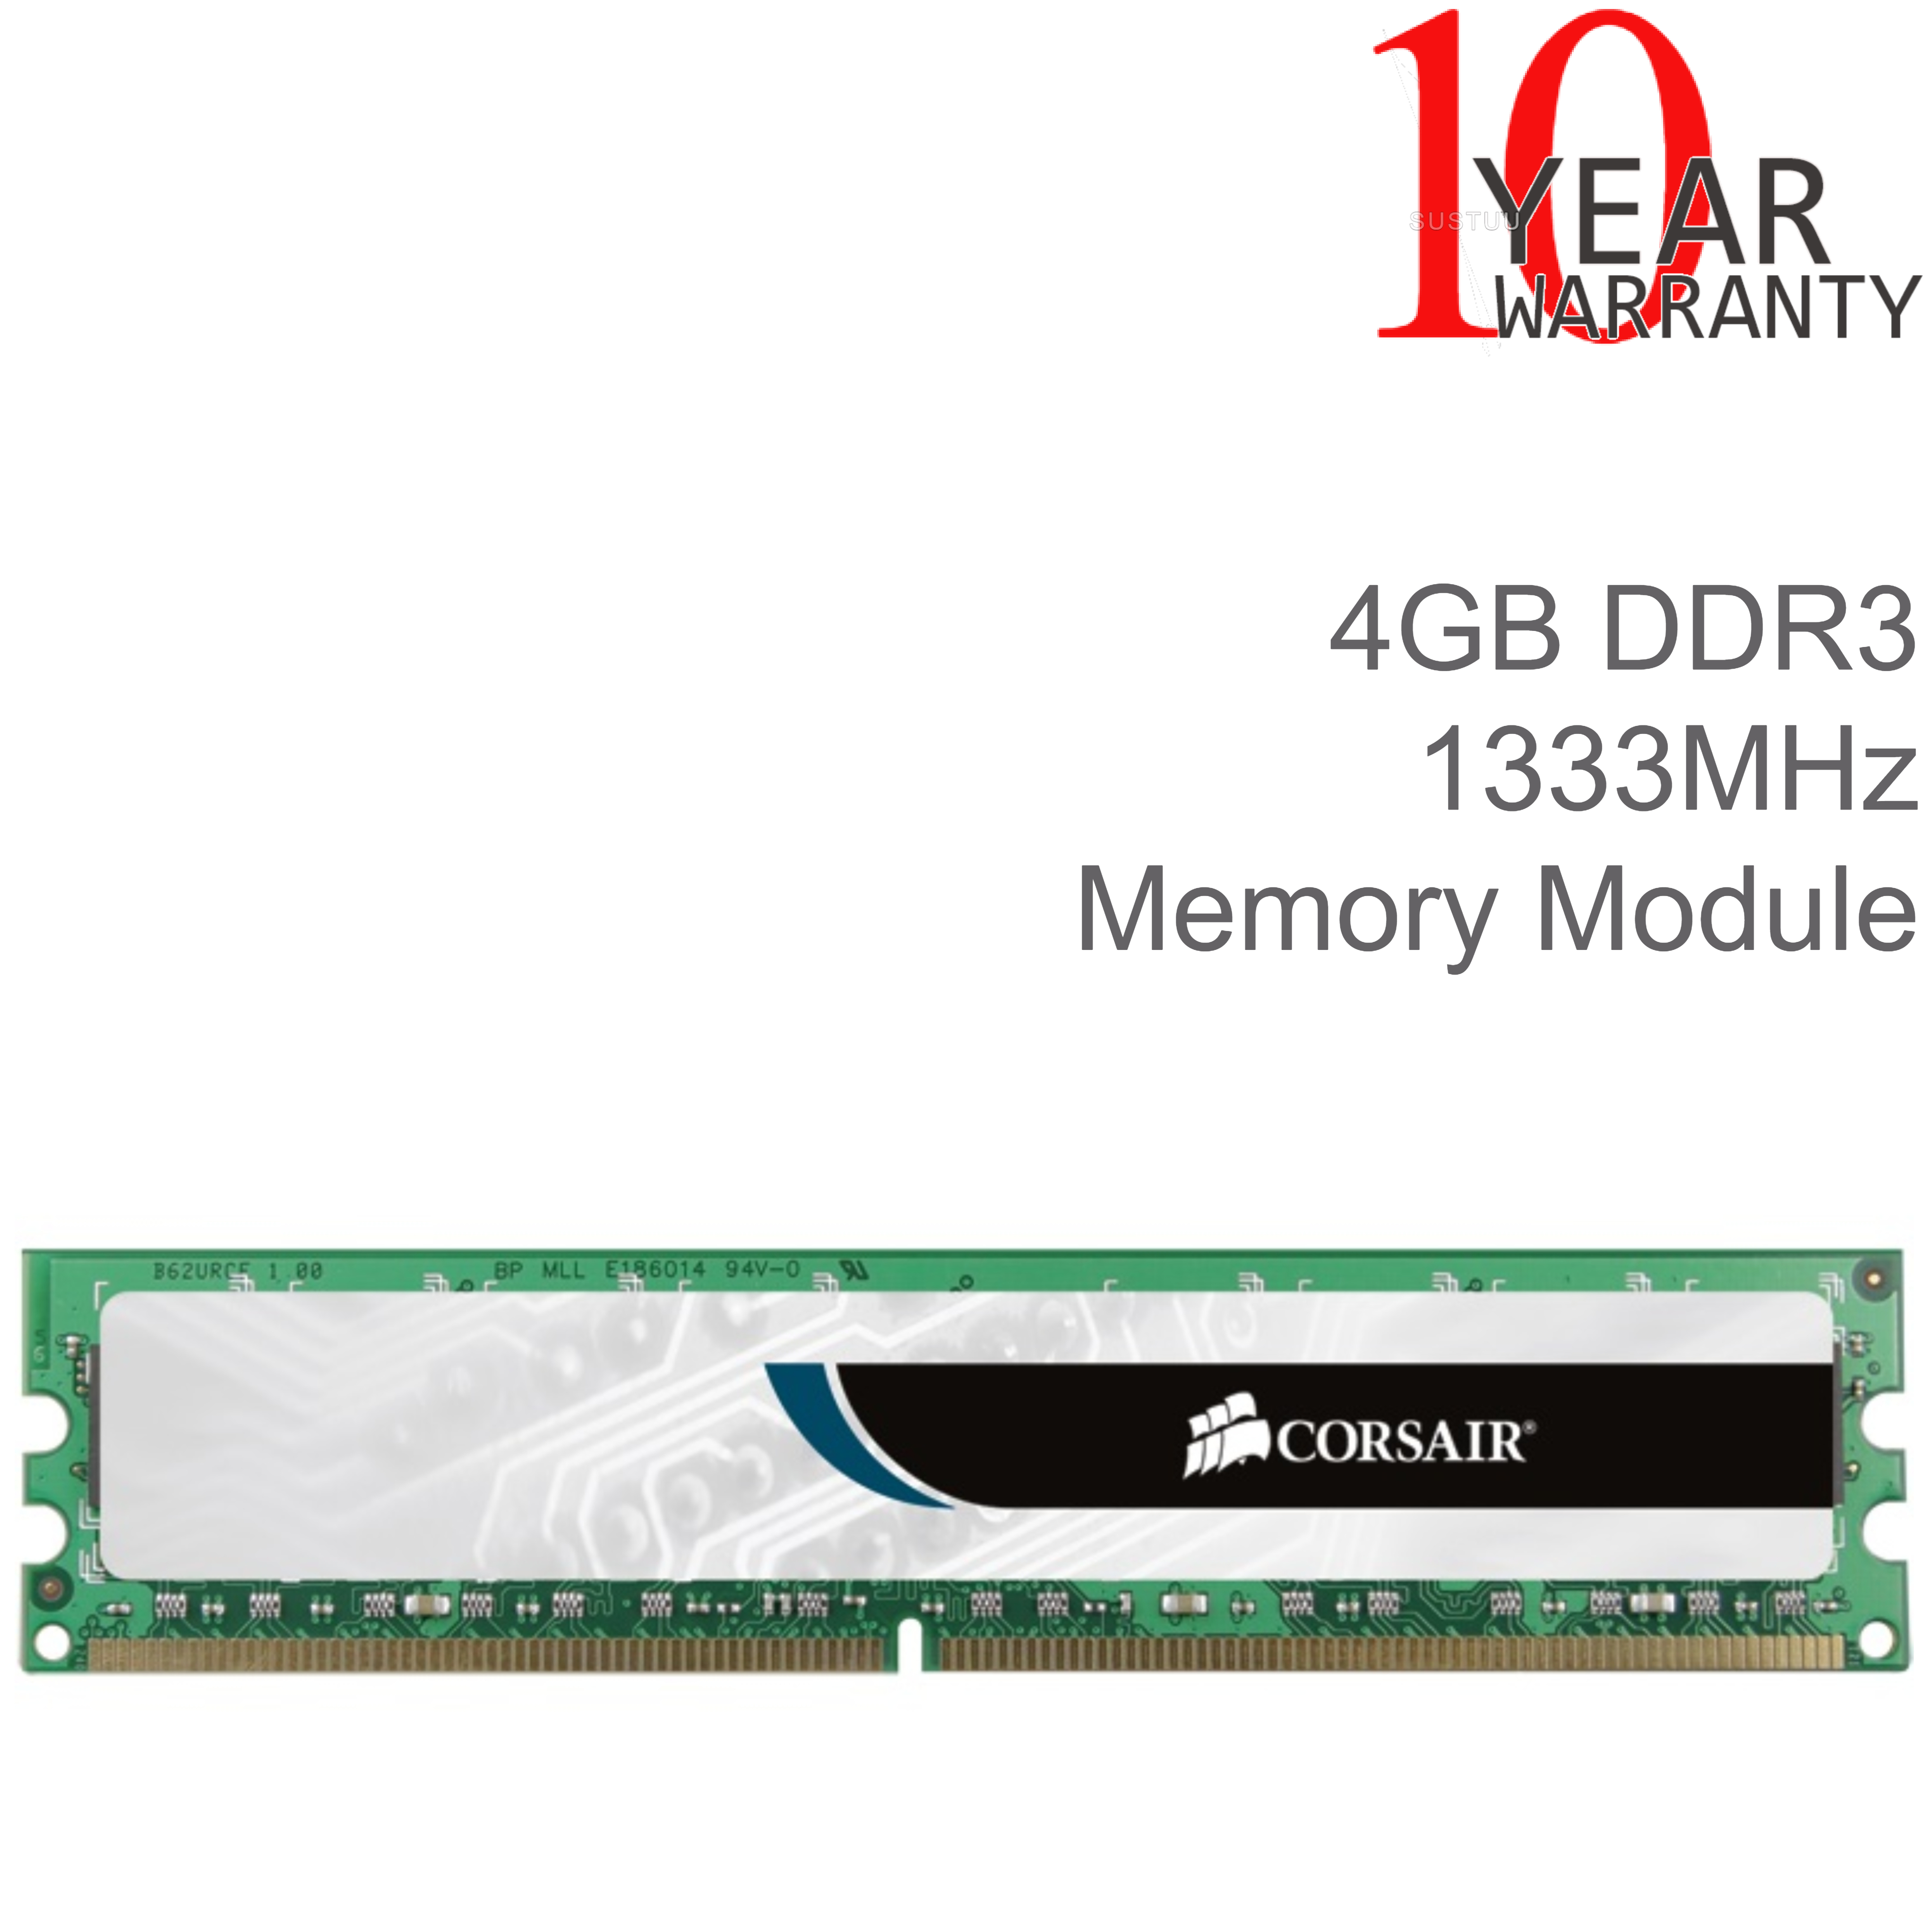 Corsair 4GB DDR3 1333MHZ Memory Module | Unbuffered CL9 Mainstream Desktop  RAM | NEW